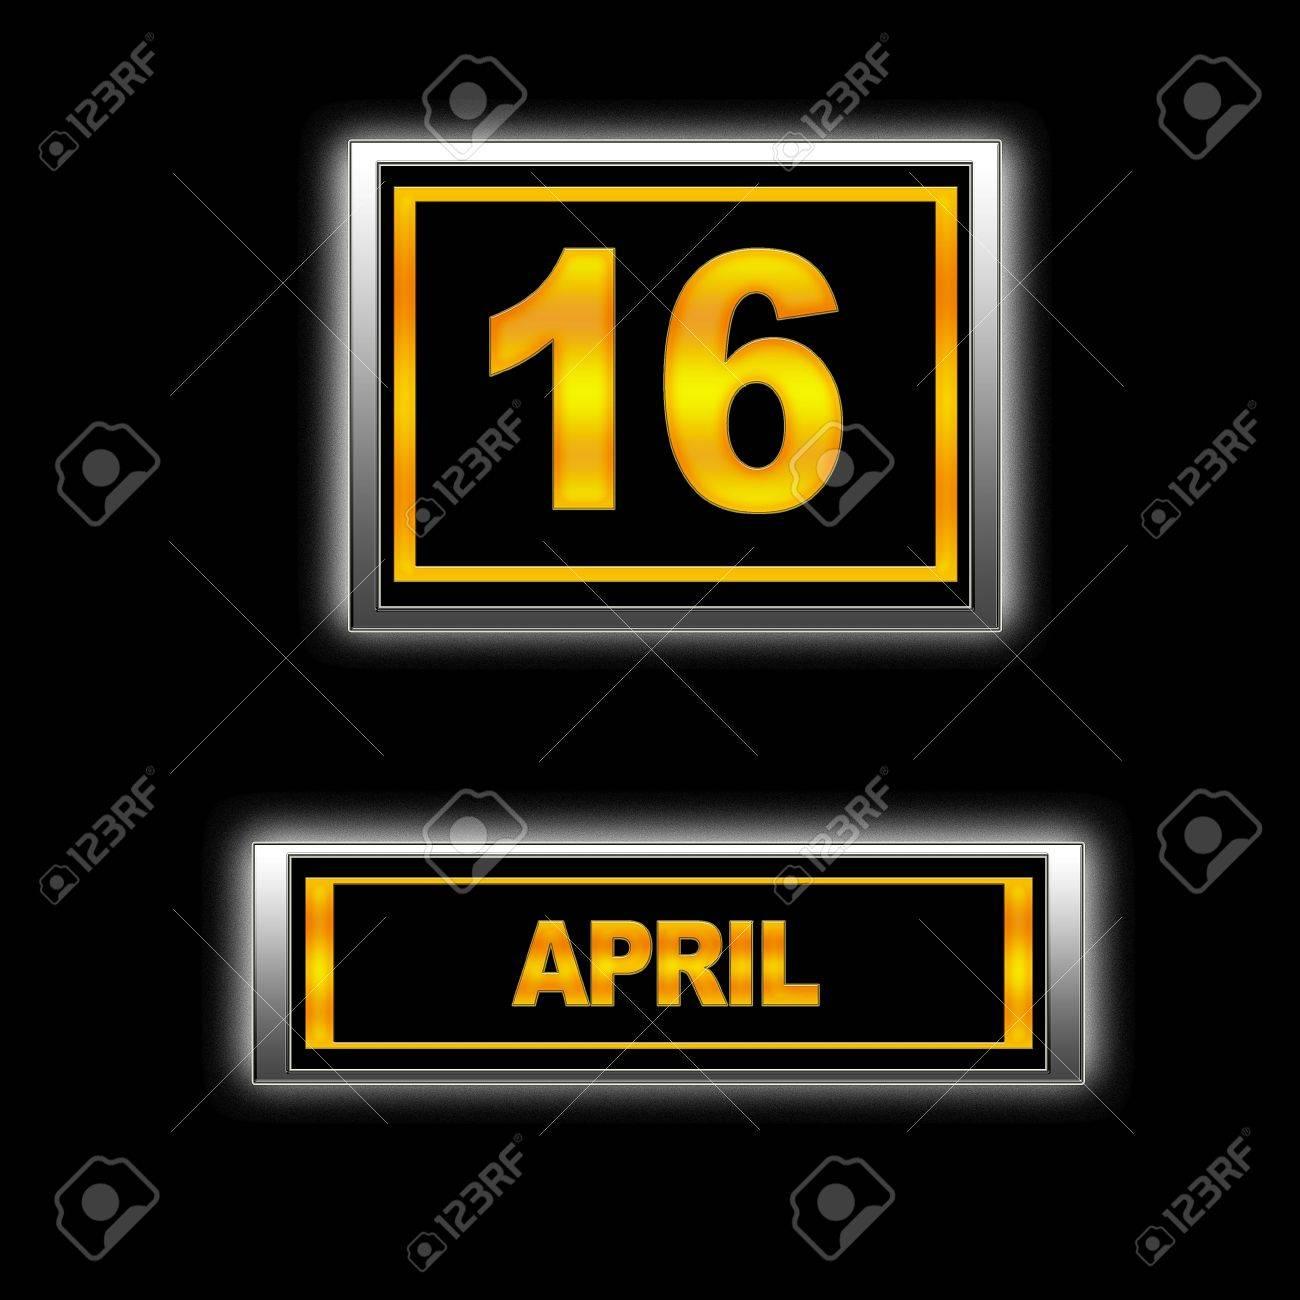 Illustration with Calendar, April   16 Stock Illustration - 13268070